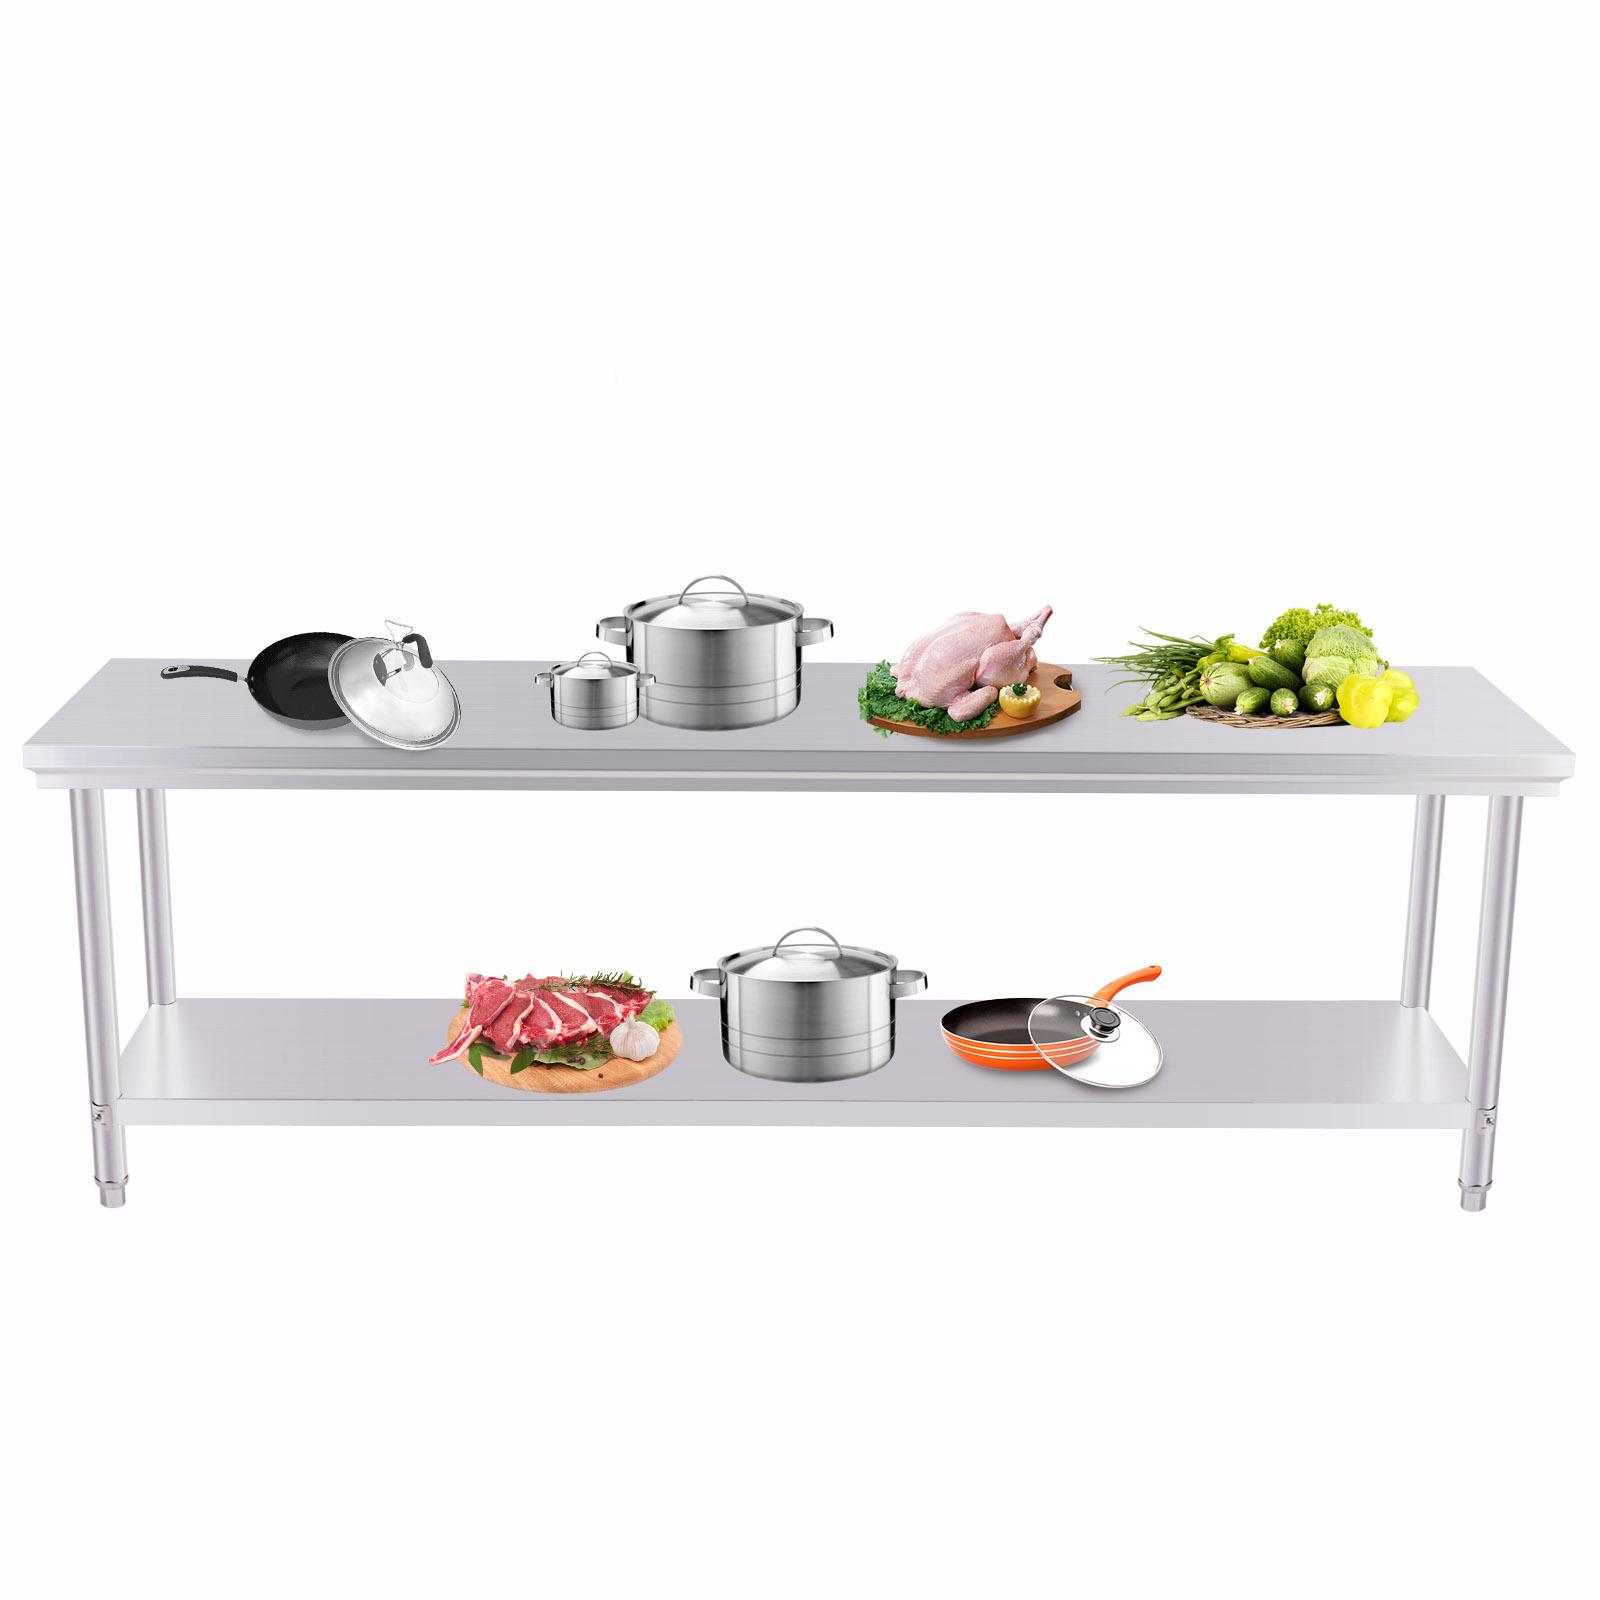 prep tables for kitchen black appliances commercial table